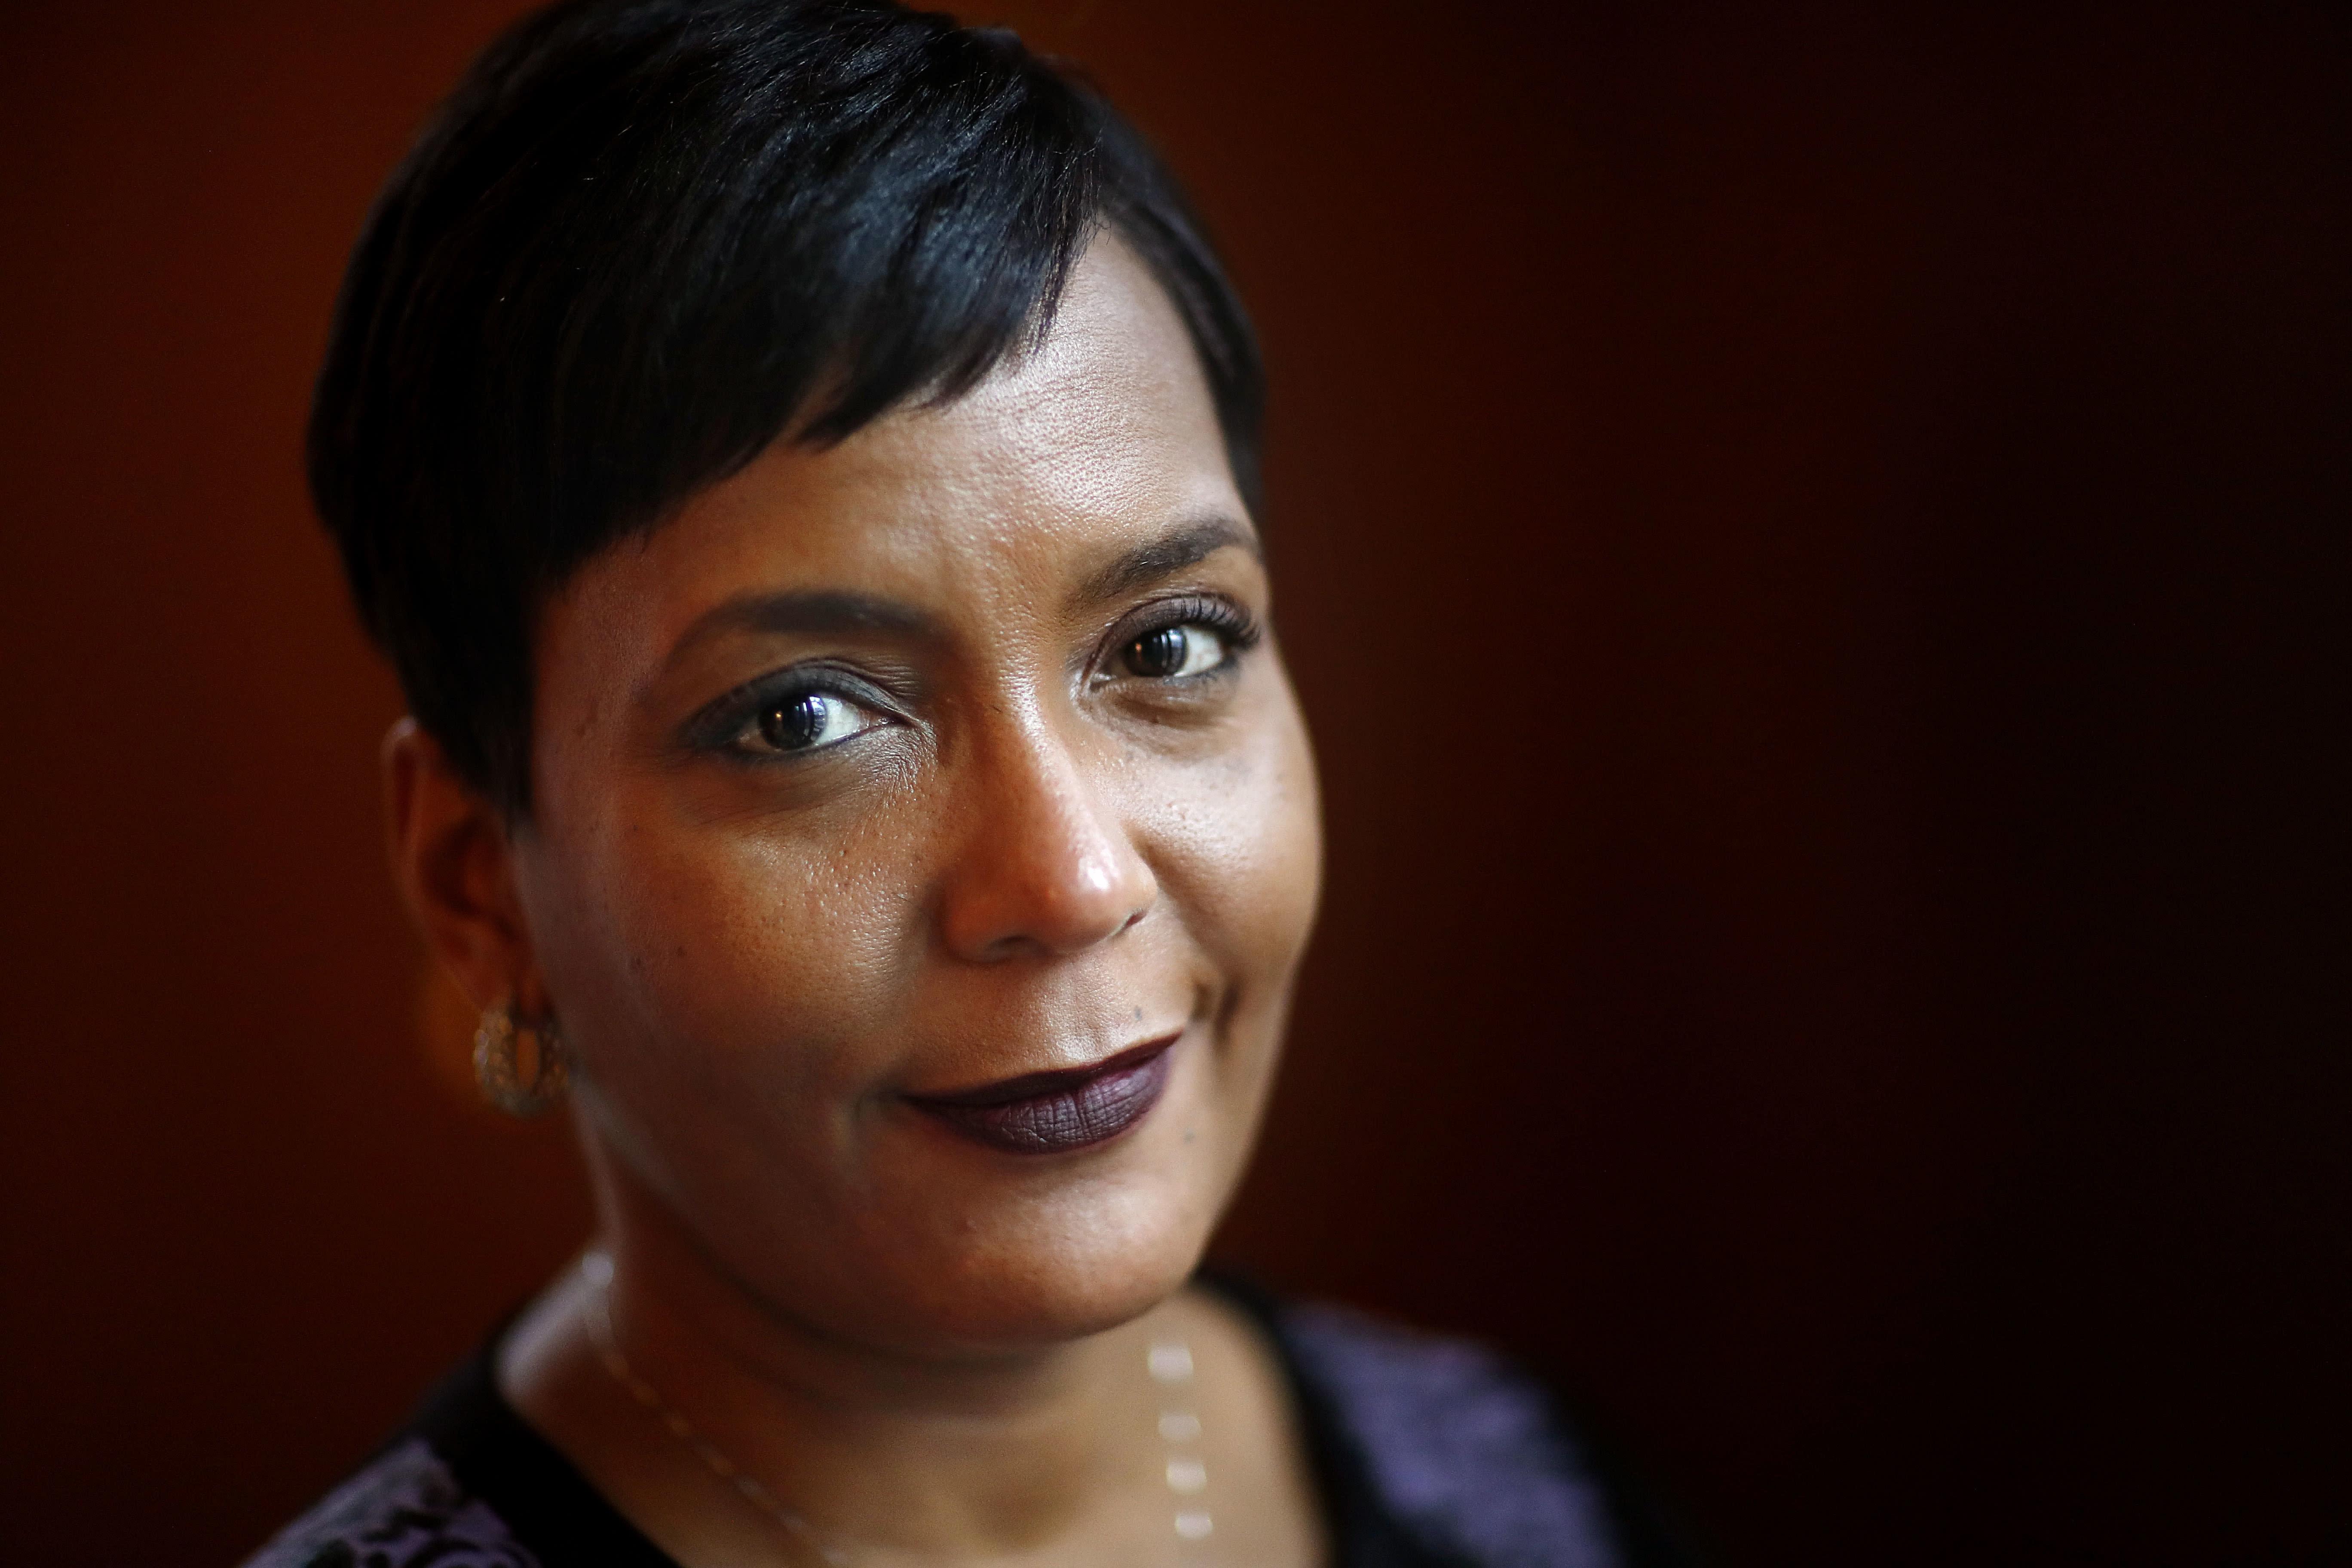 FILE - In this Jan. 11, 2018, file photo, Atlanta Mayor Keisha Lance Bottoms poses for a photo in her office in Atlanta. (AP Photo/David Goldman, File)